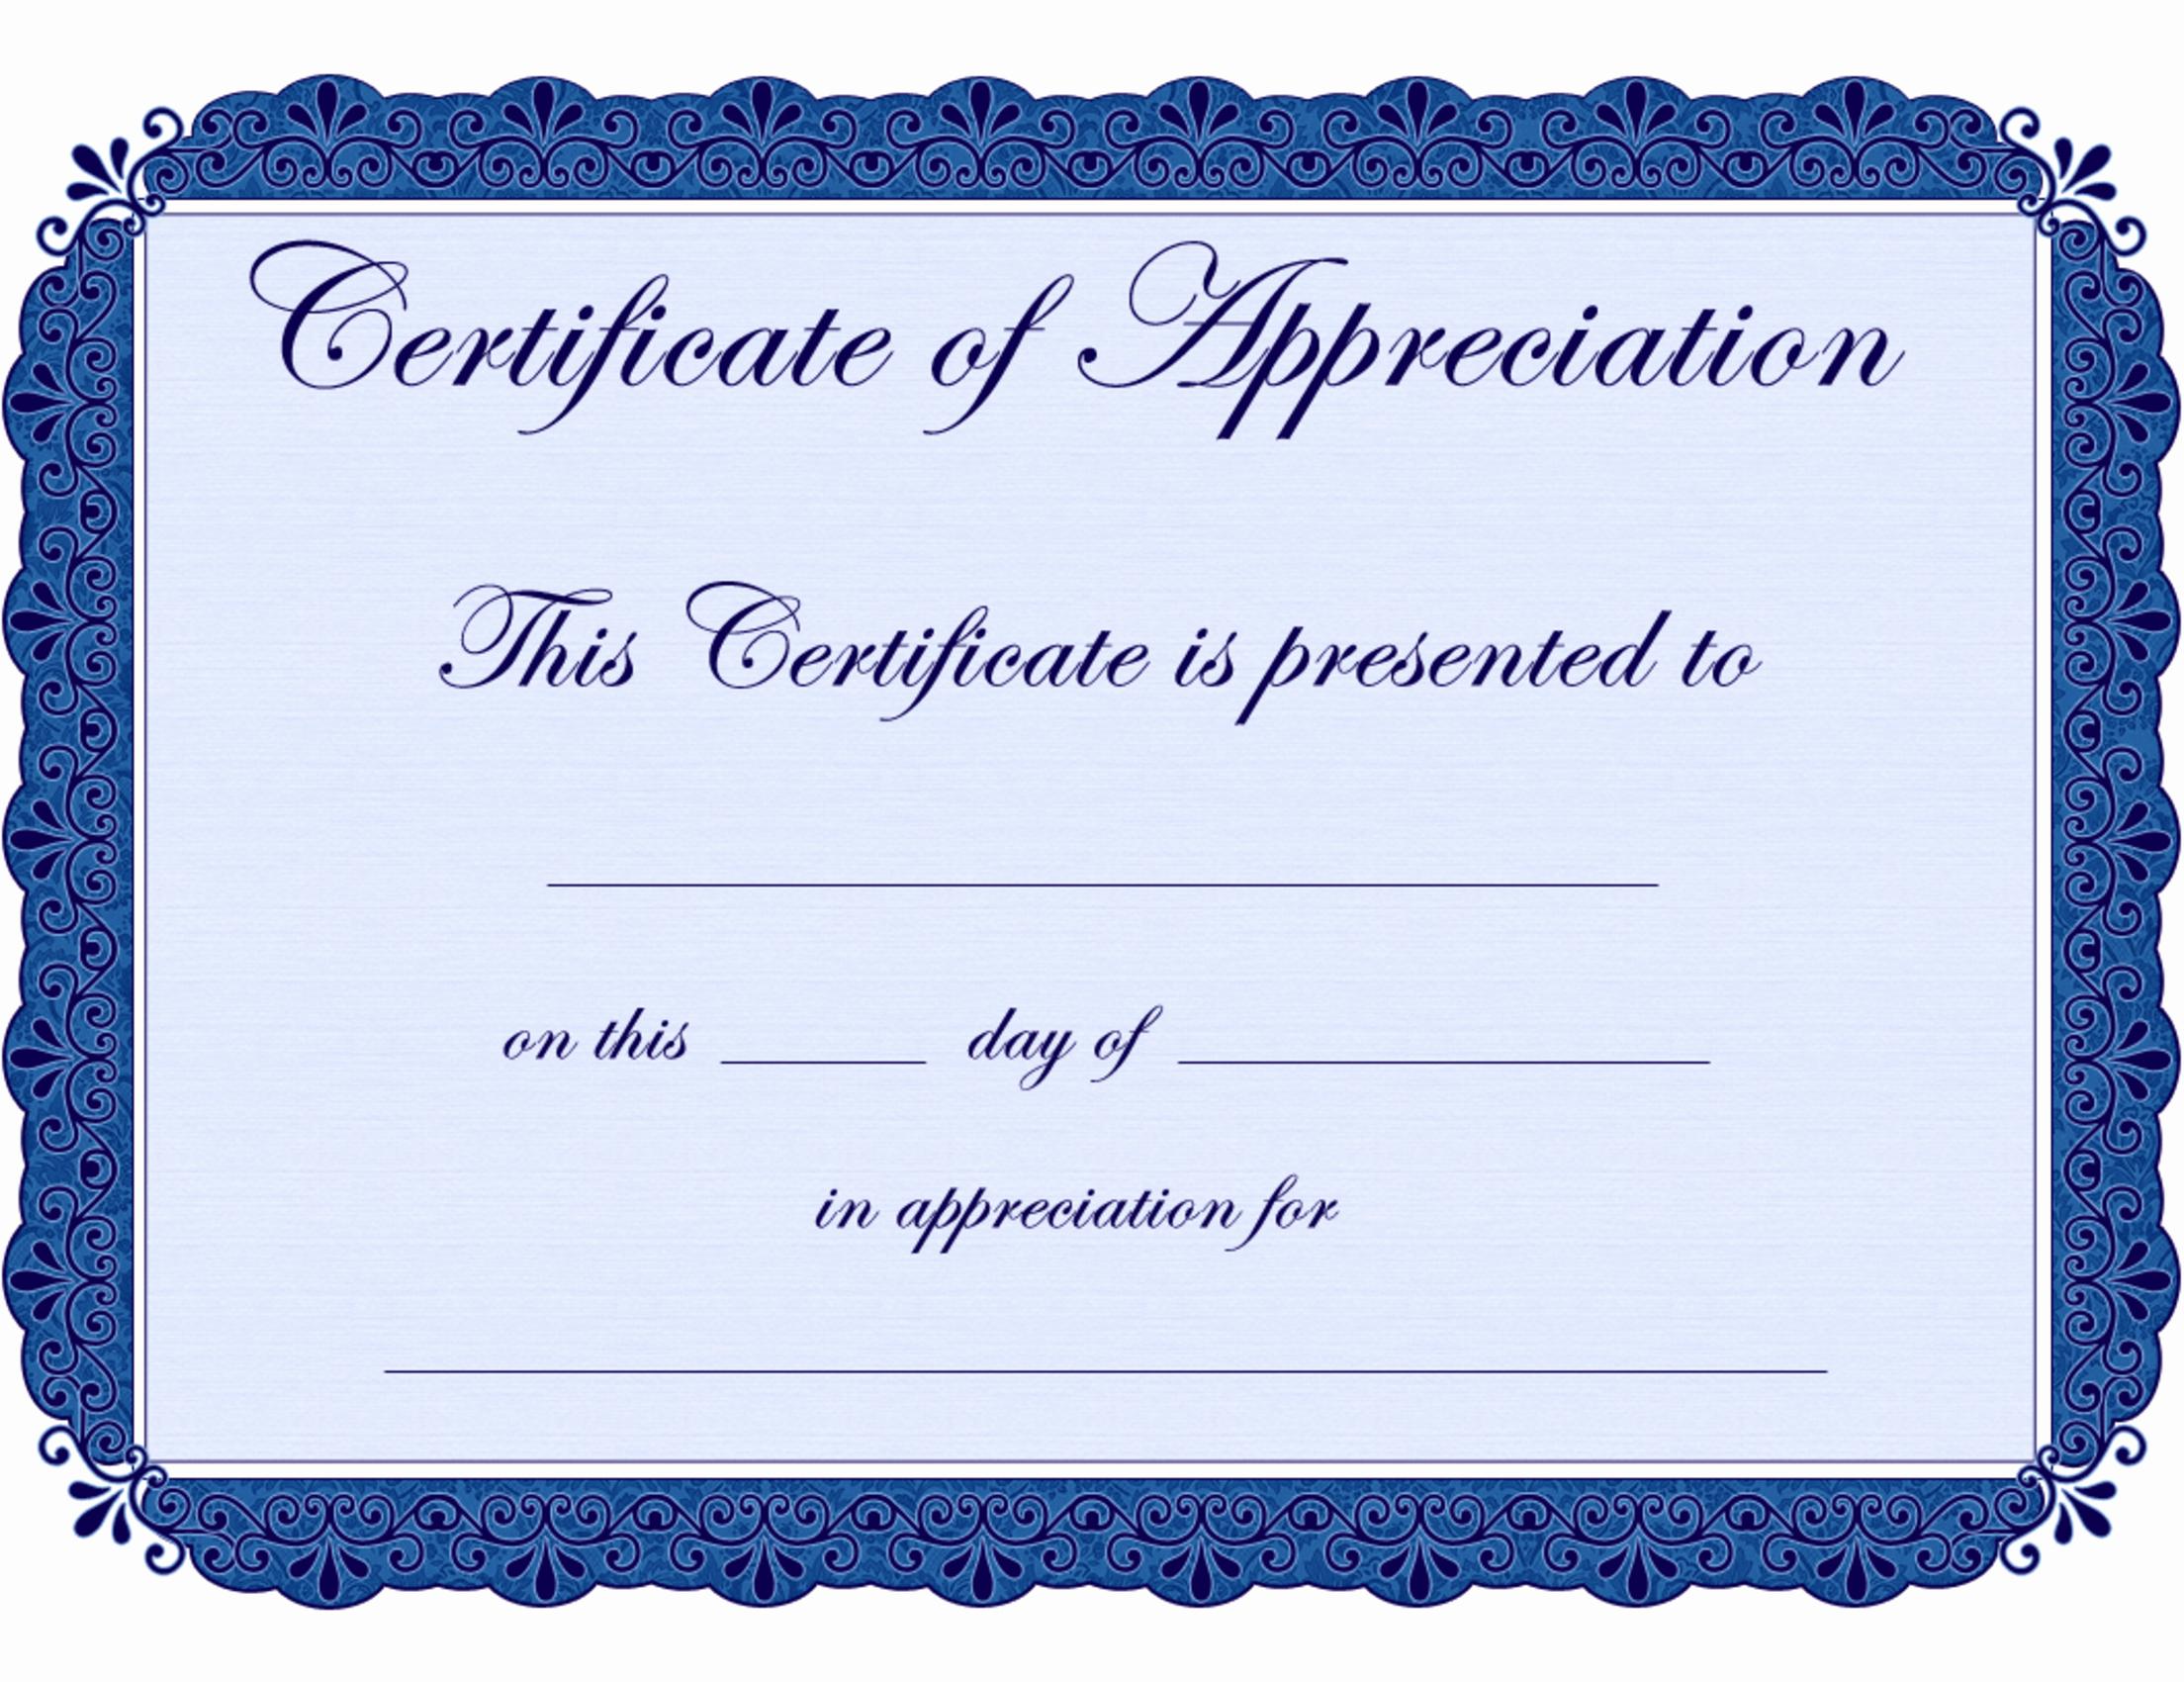 Graduation Certificate Of Appreciation Lovely Free Printable Certificates Certificate Of Appreciation